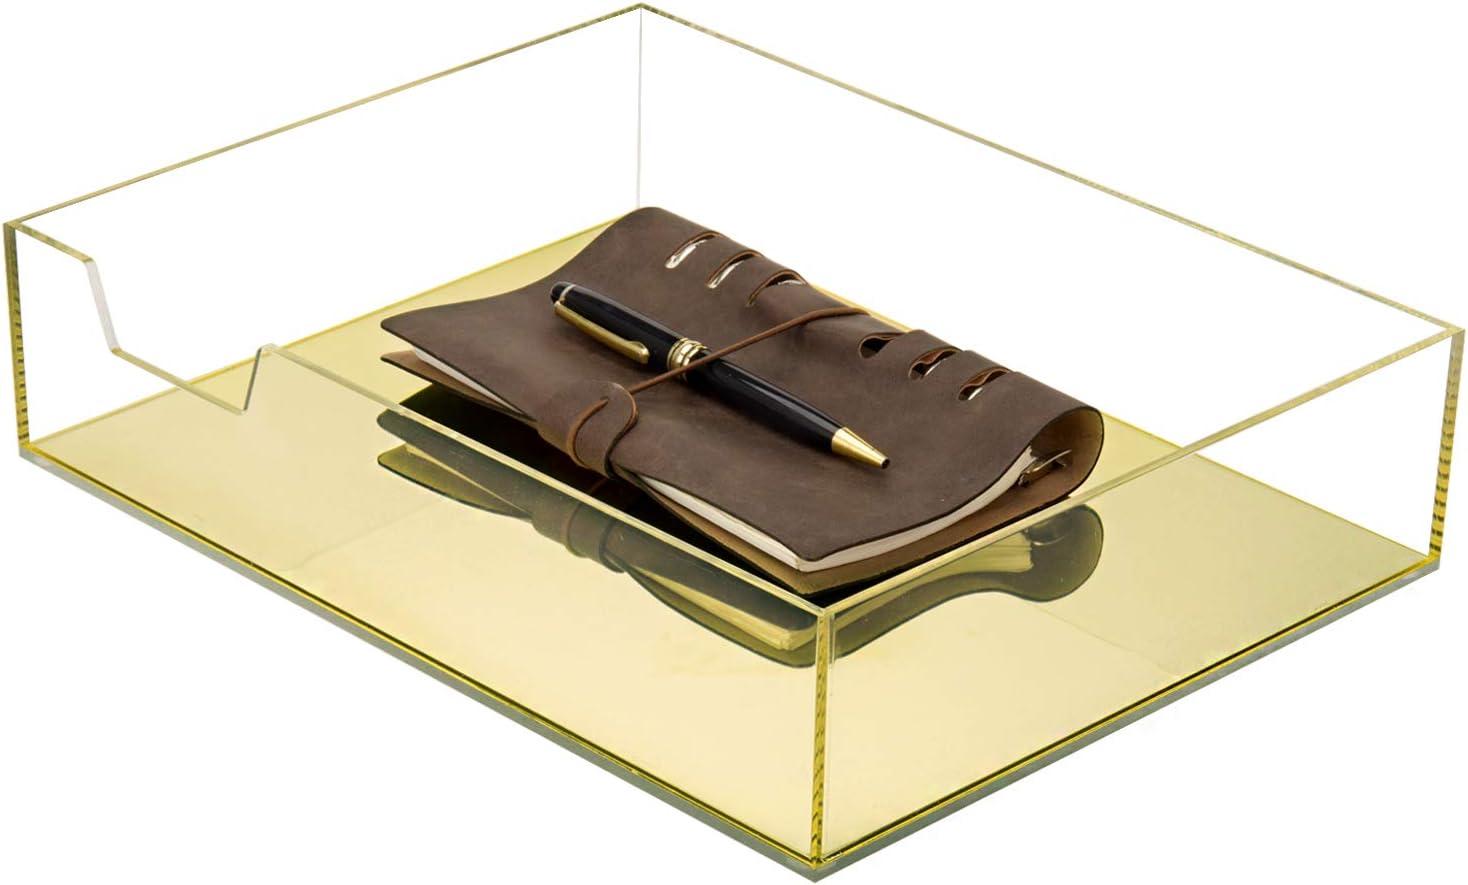 MyGift Gold Acrylic Office Desktop Paper/File Folder/Document Storage, Letter Organizer Tray